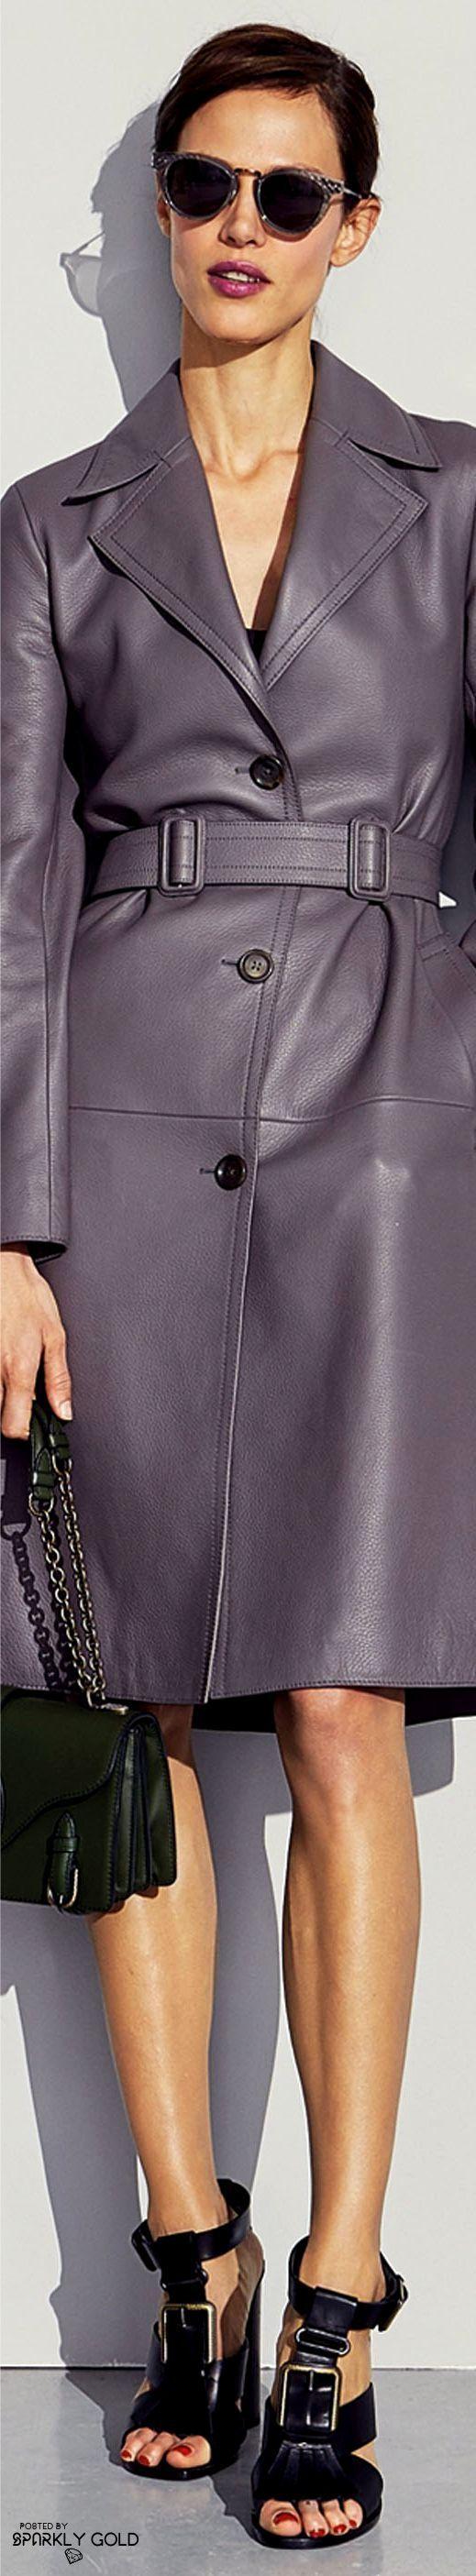 Bottega Veneta Pre-Fall 2017 Collection & more luxury details